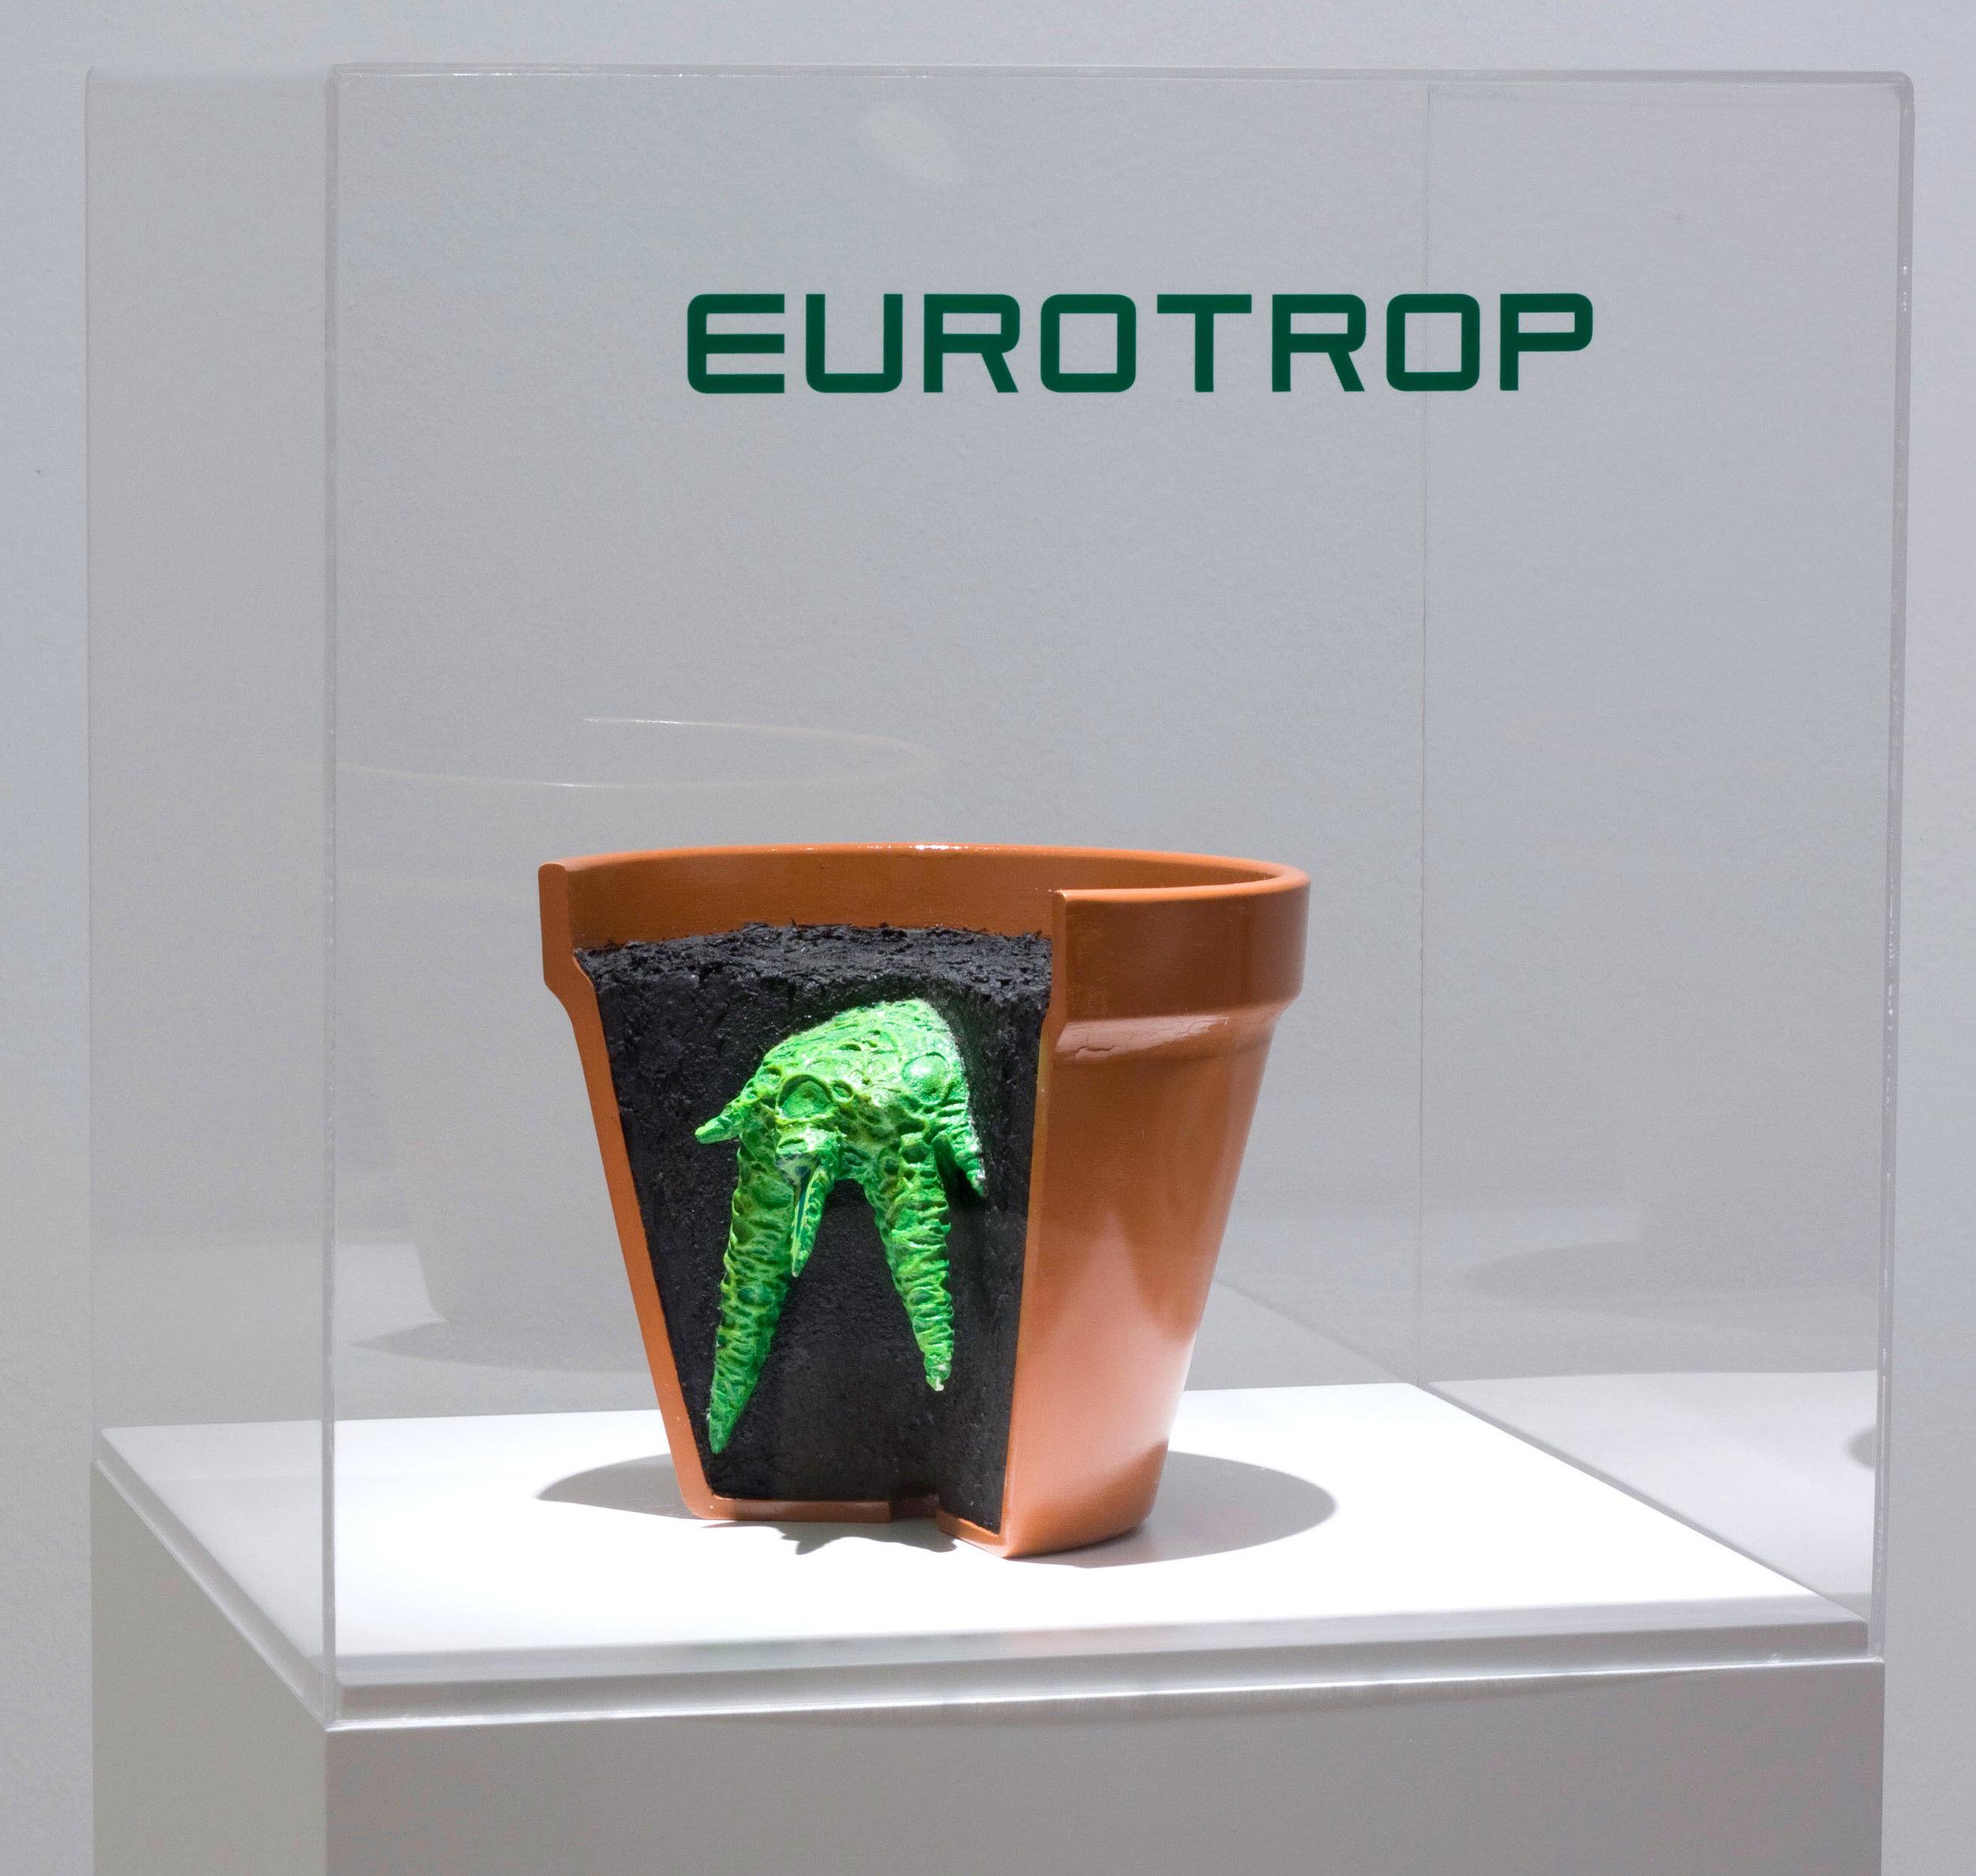 Eurofarm – EUROTROP 1998, the ideal house plant